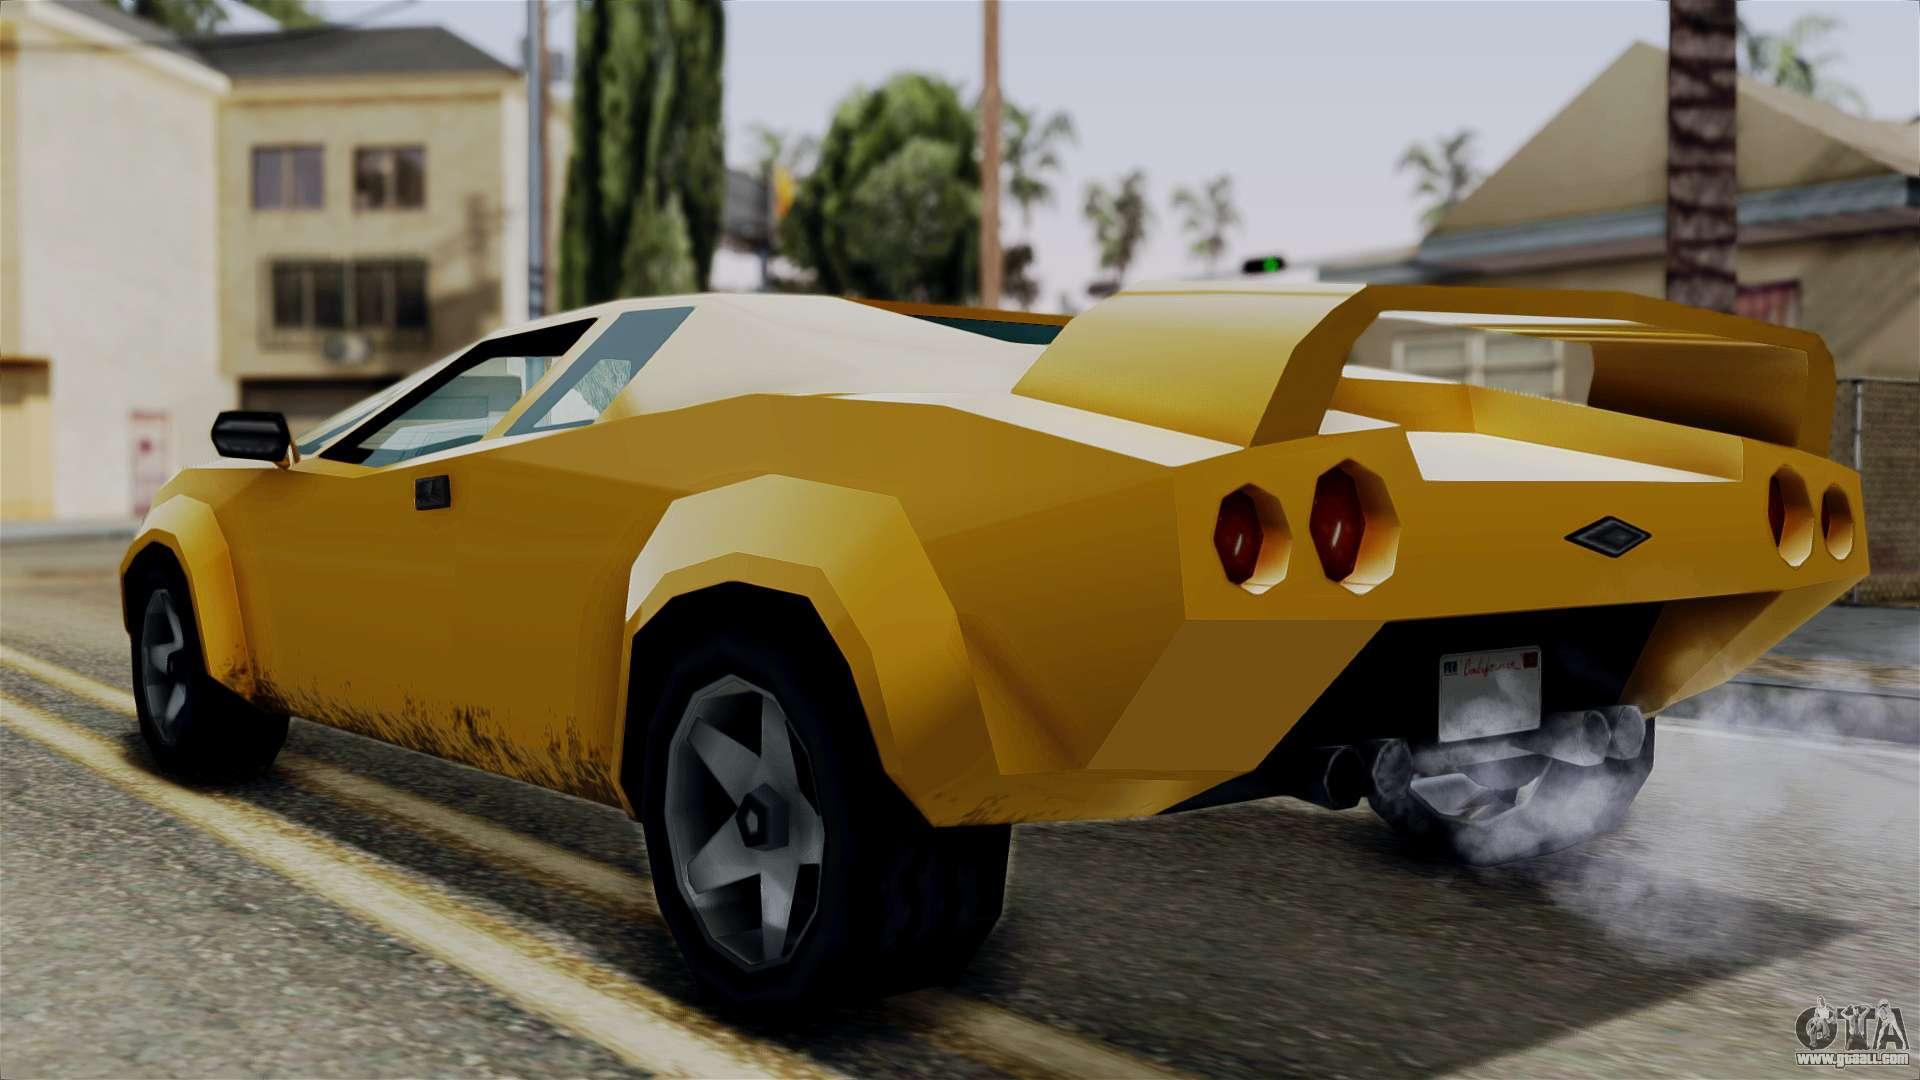 Gta vice city infernus speed mod download : Knc coin design